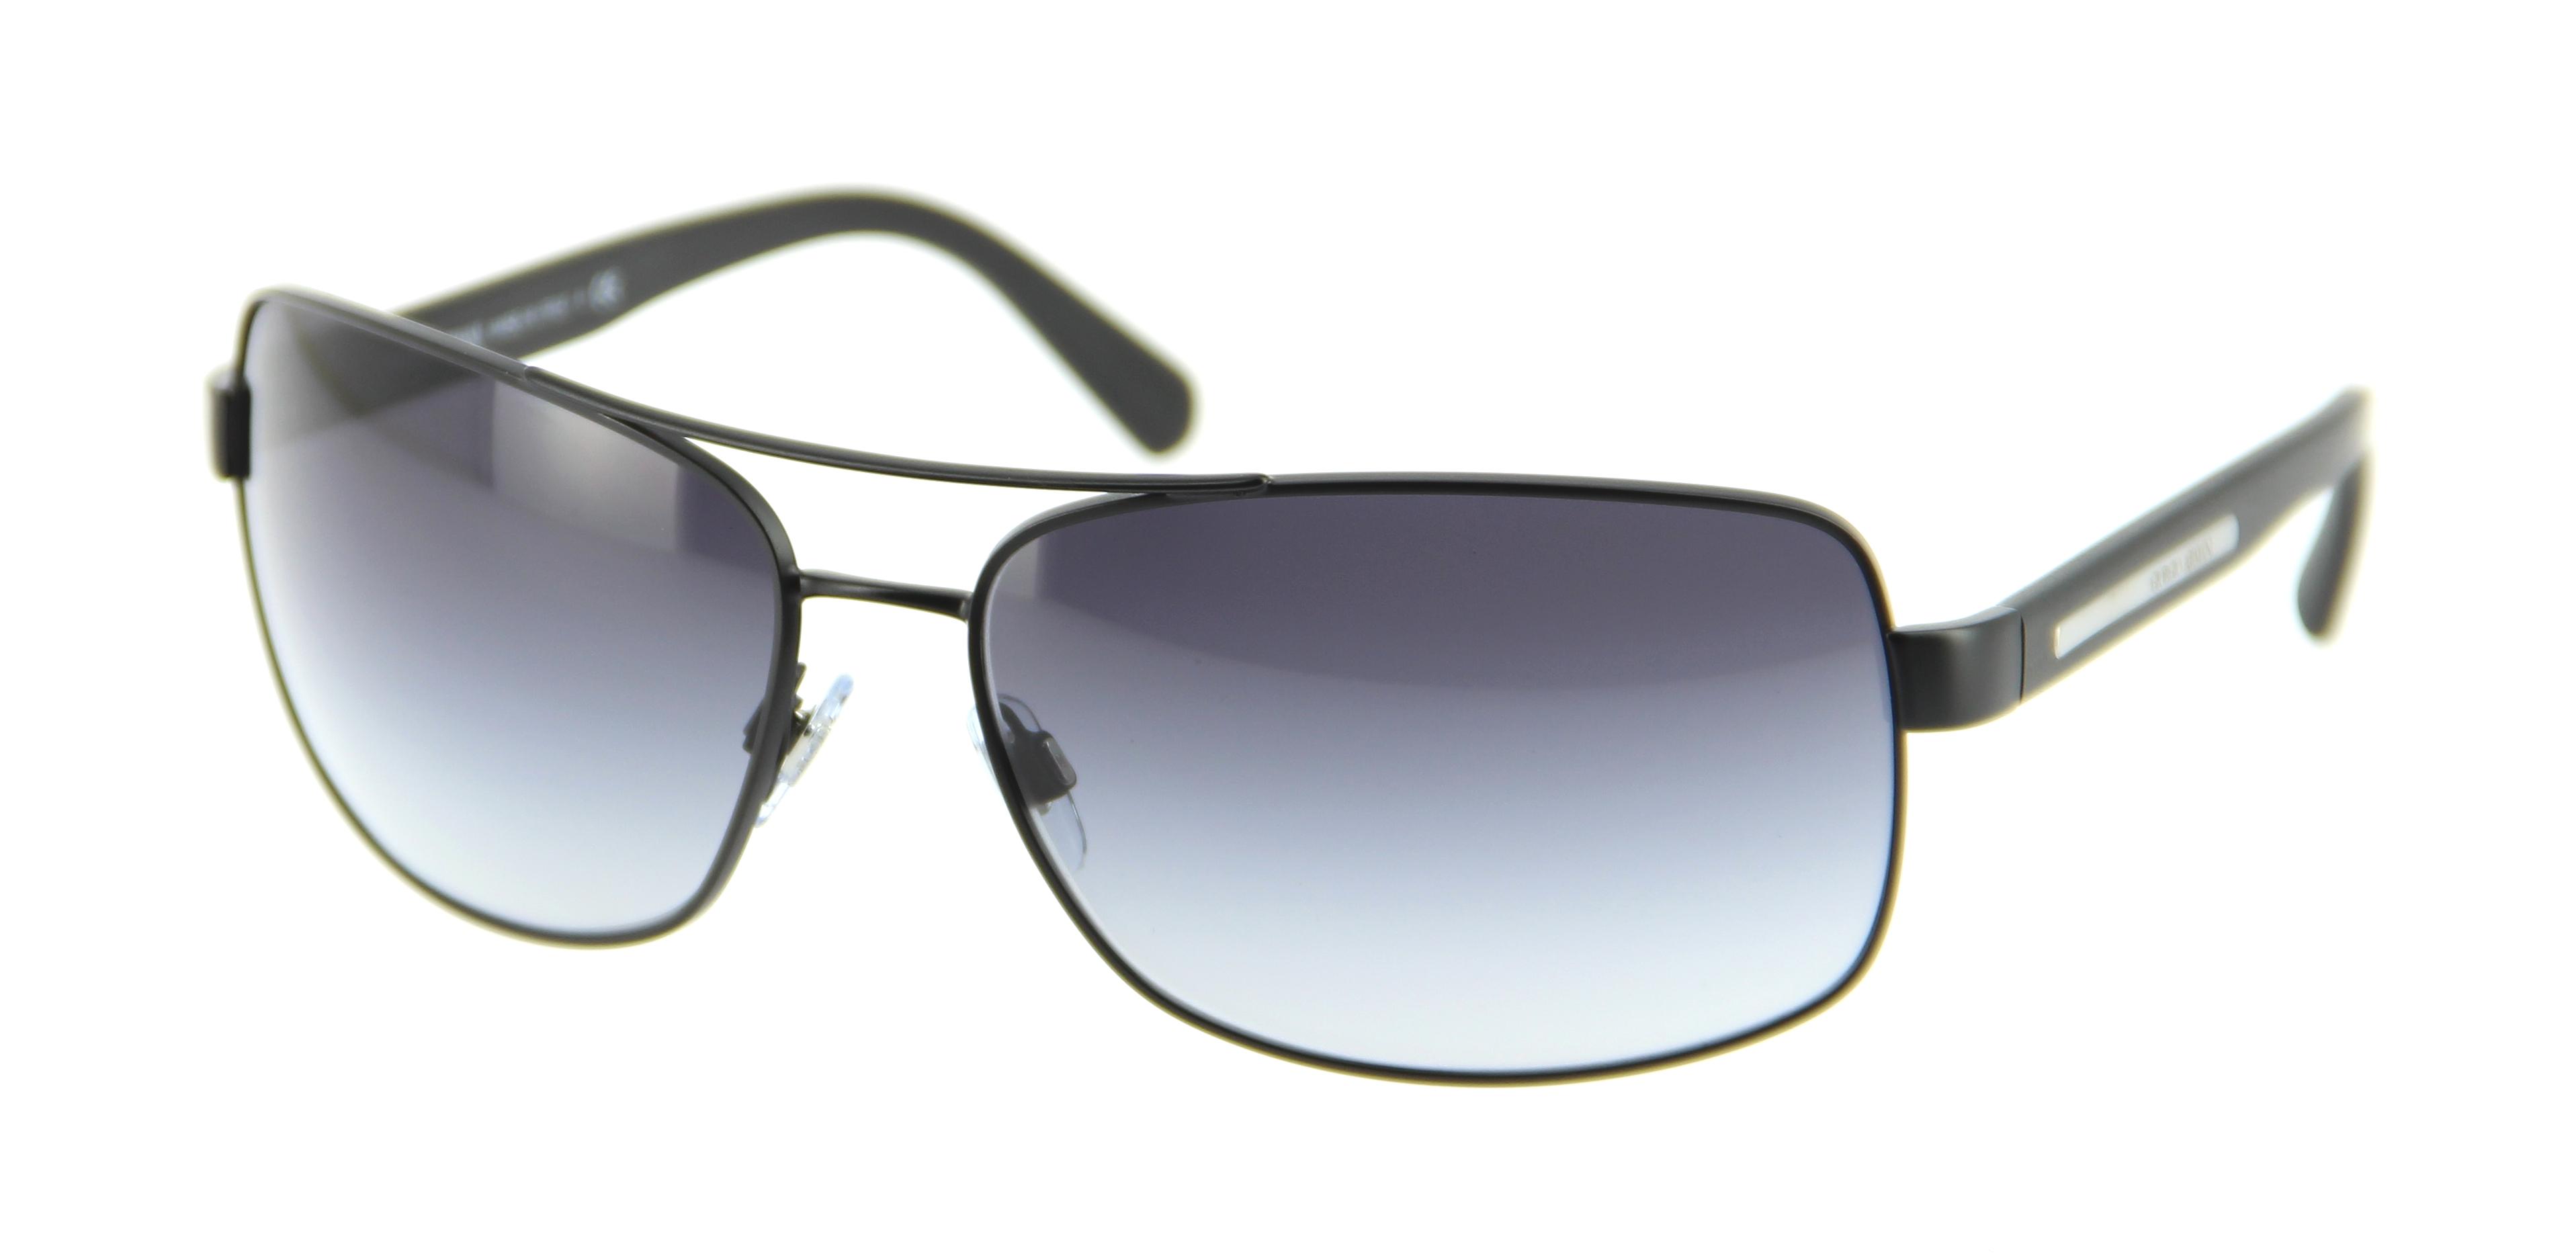 lunette giorgio armani homme prix 72e6a64feab9